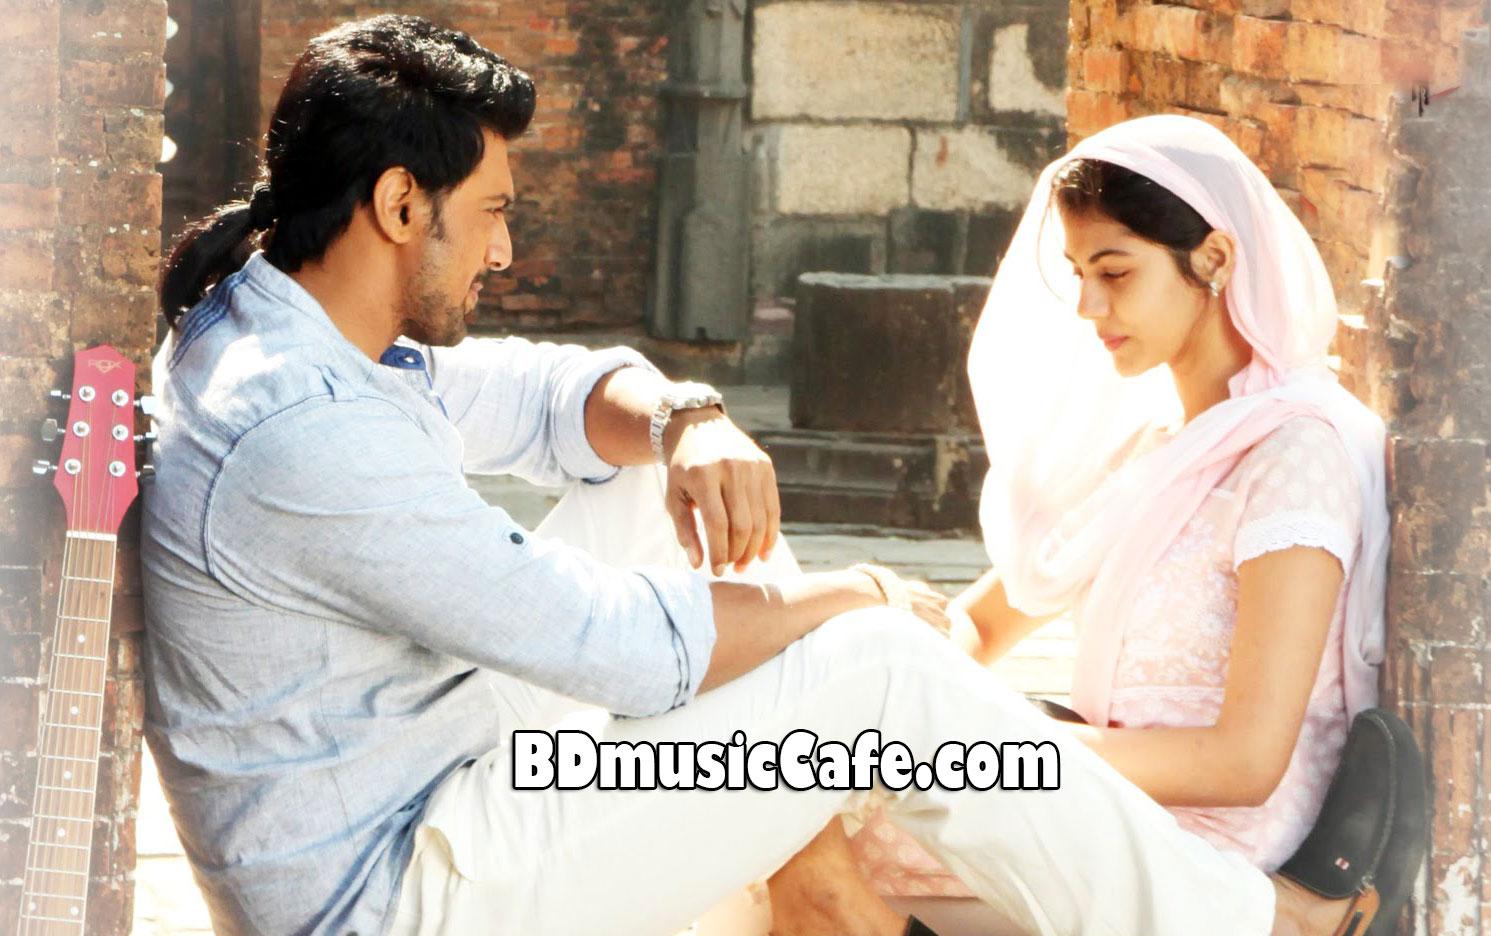 ... Movie Official Full Trailer, Arshinagar Indian Bangla Movie Trailer